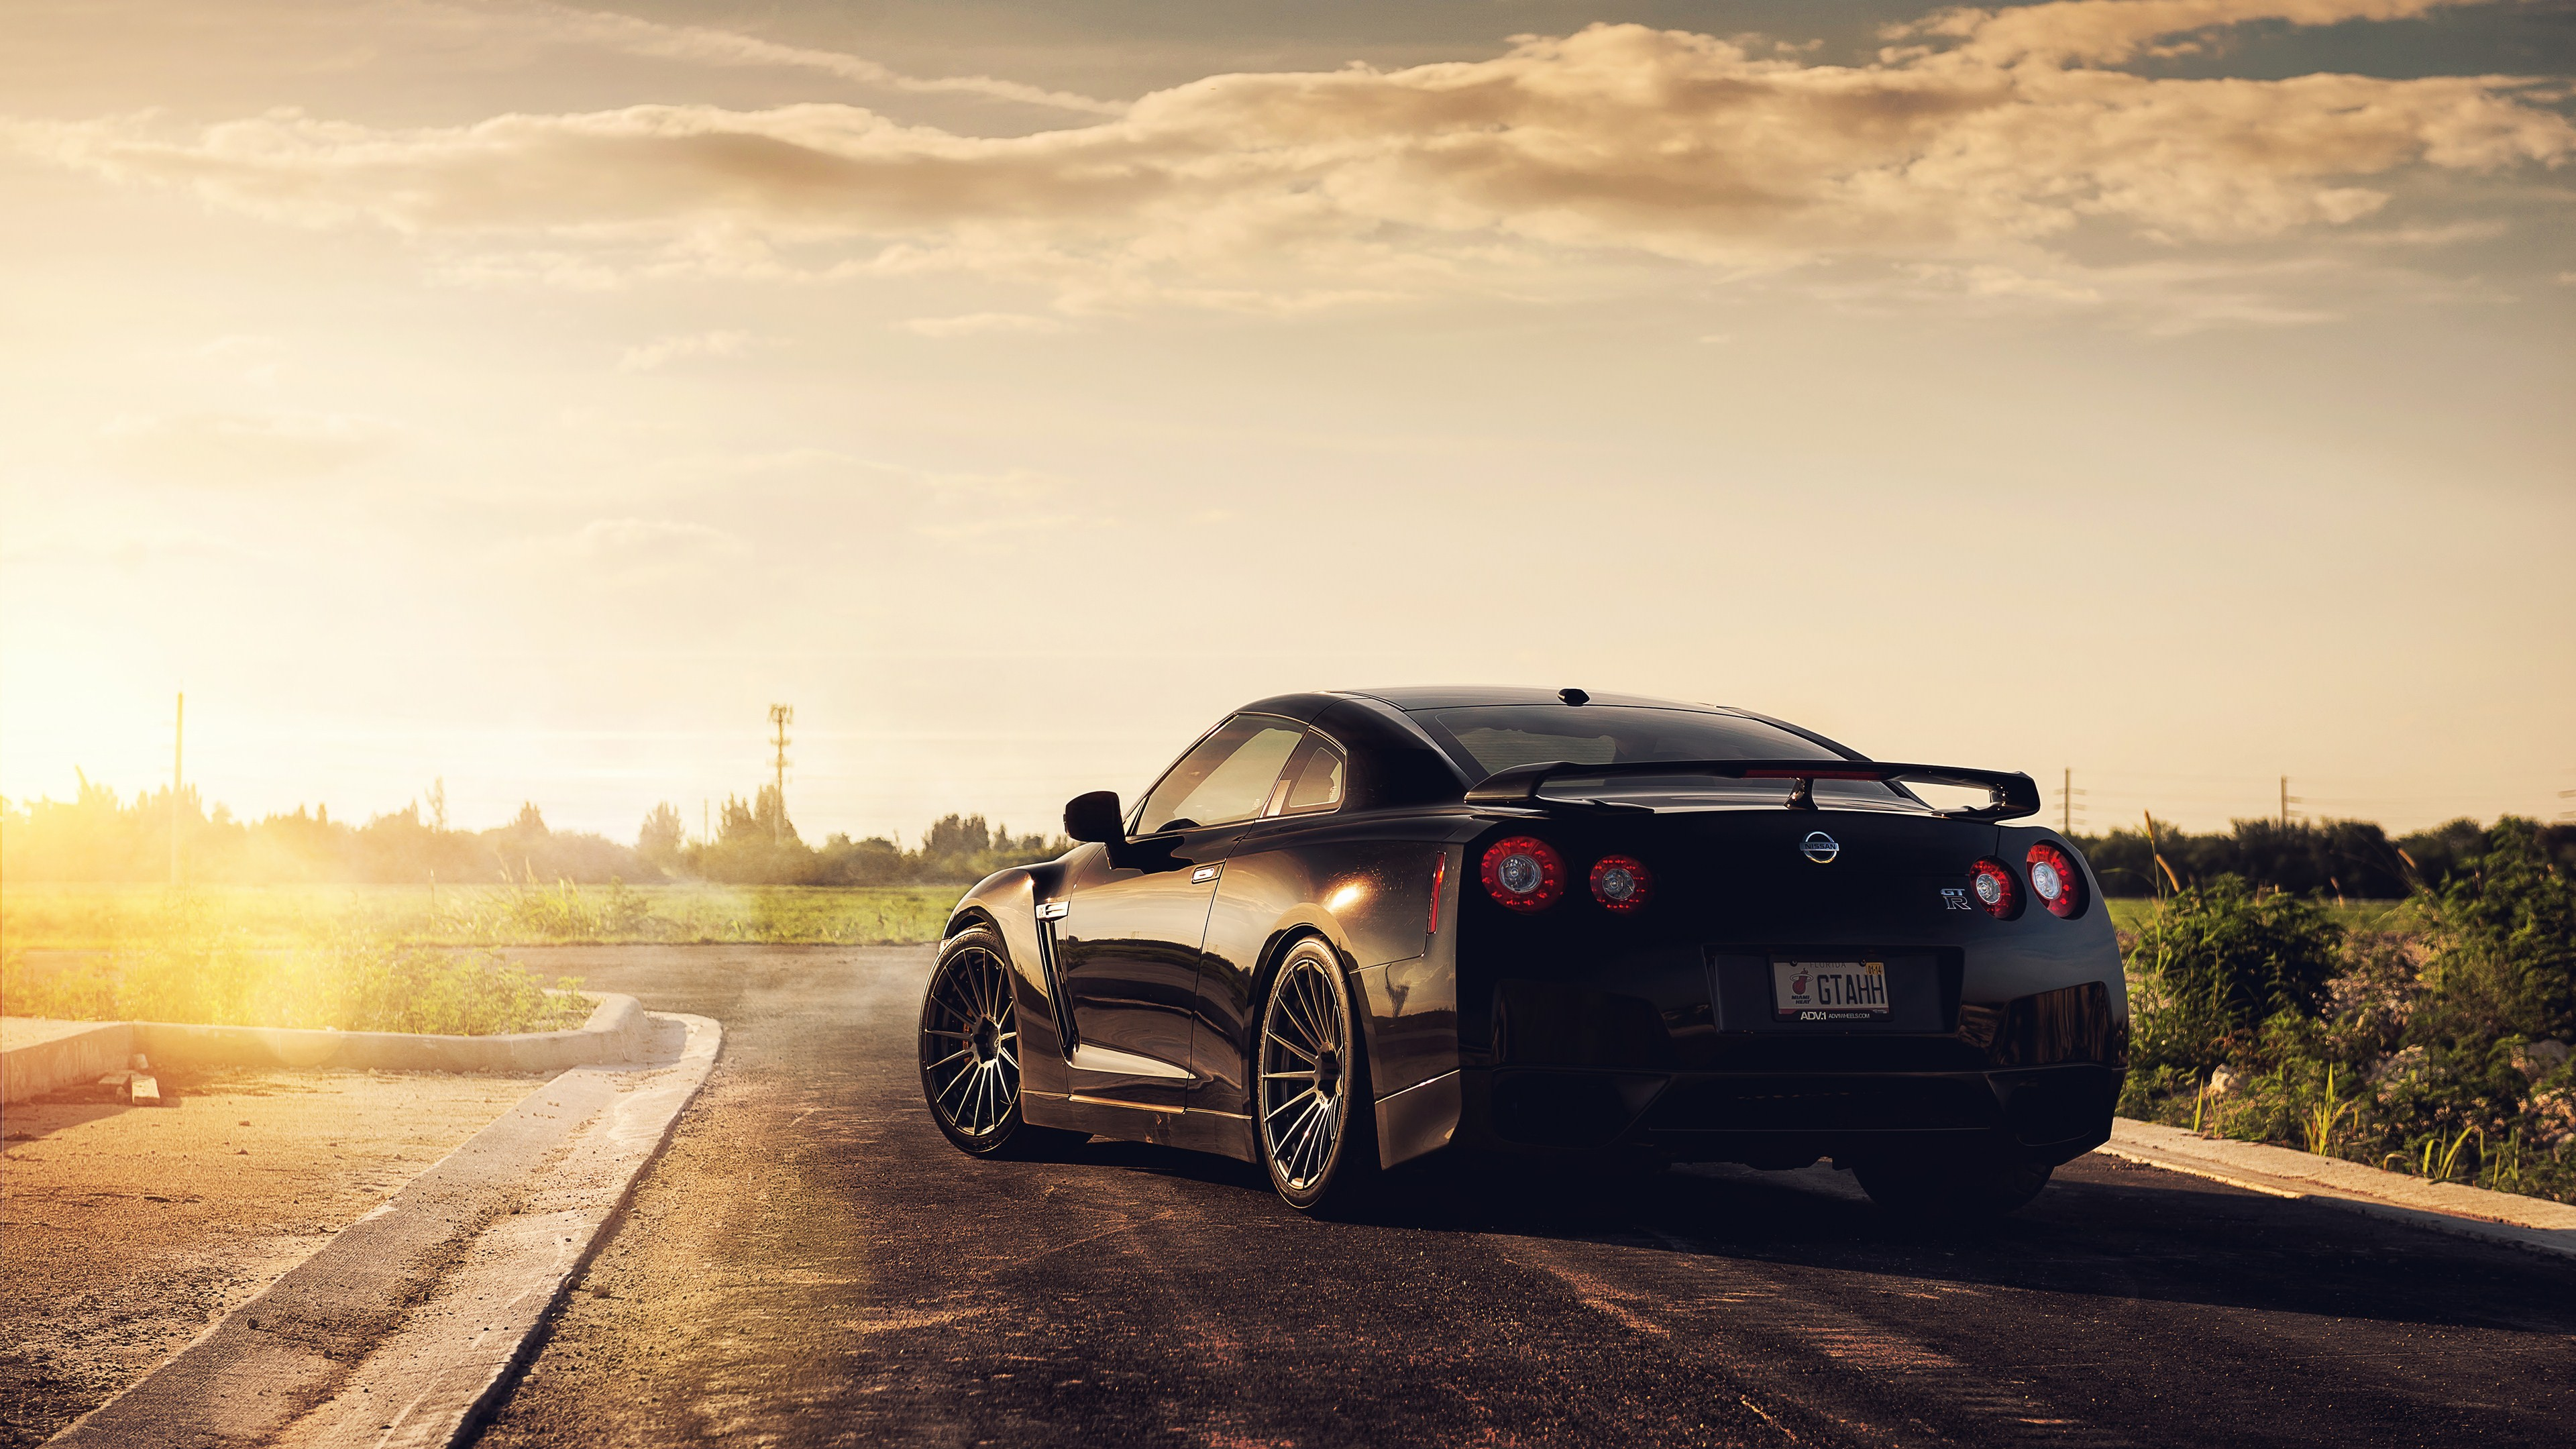 Nissan Gtr Black Car Wallpaper For Desktop And Mobiles 4k Ultra Hd